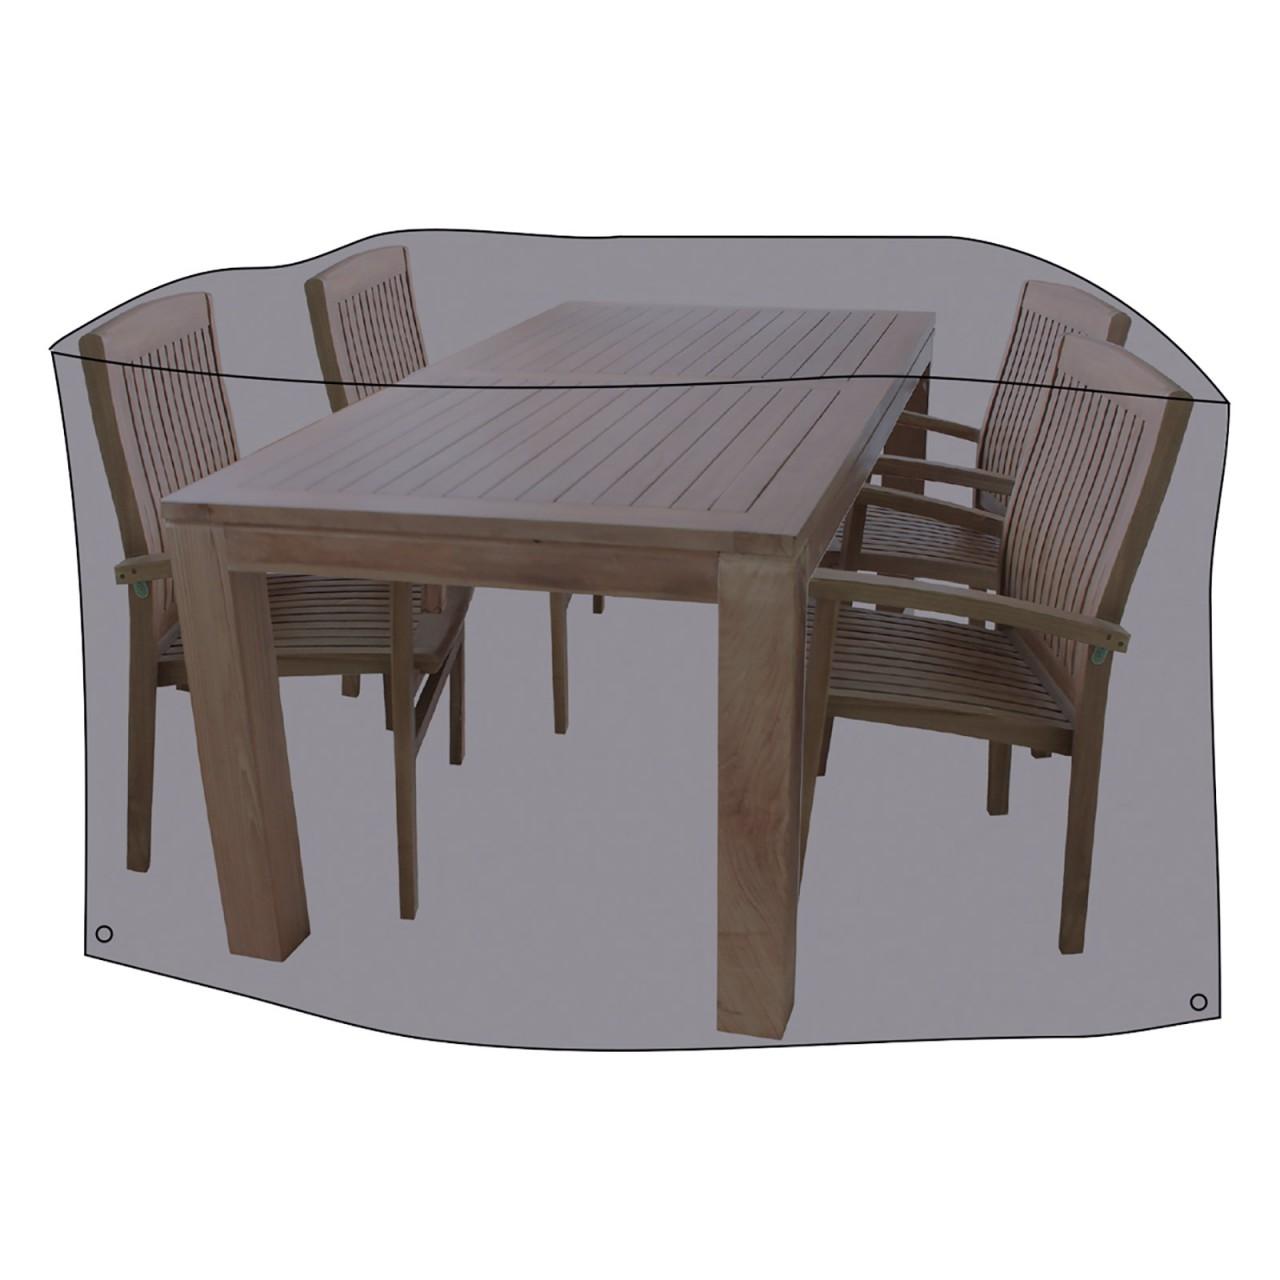 lex schutzh lle f r sitzgruppen 200 x 95 cm tragetasche. Black Bedroom Furniture Sets. Home Design Ideas